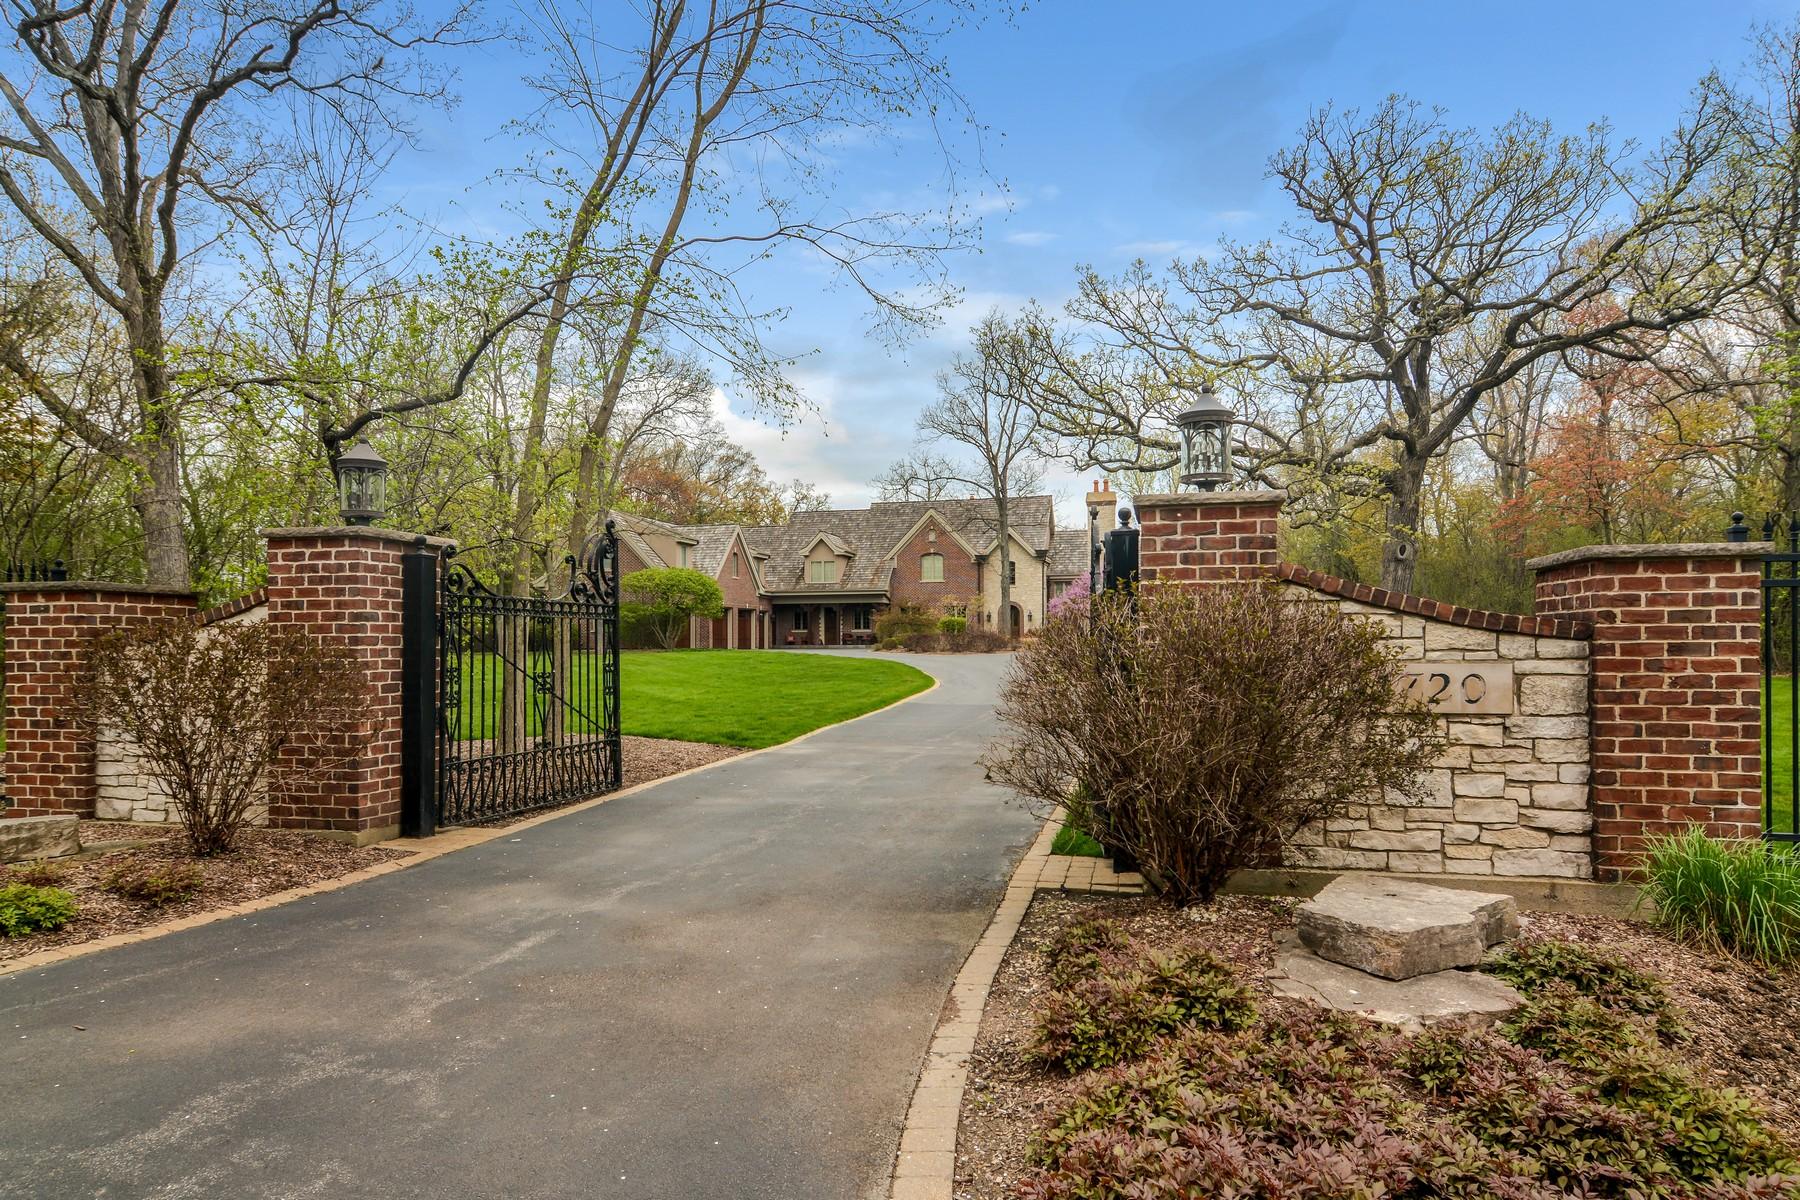 Single Family Home for Sale at Multi-Generation Retreat 1720 Sunset Lane Bannockburn, Illinois 60015 United States